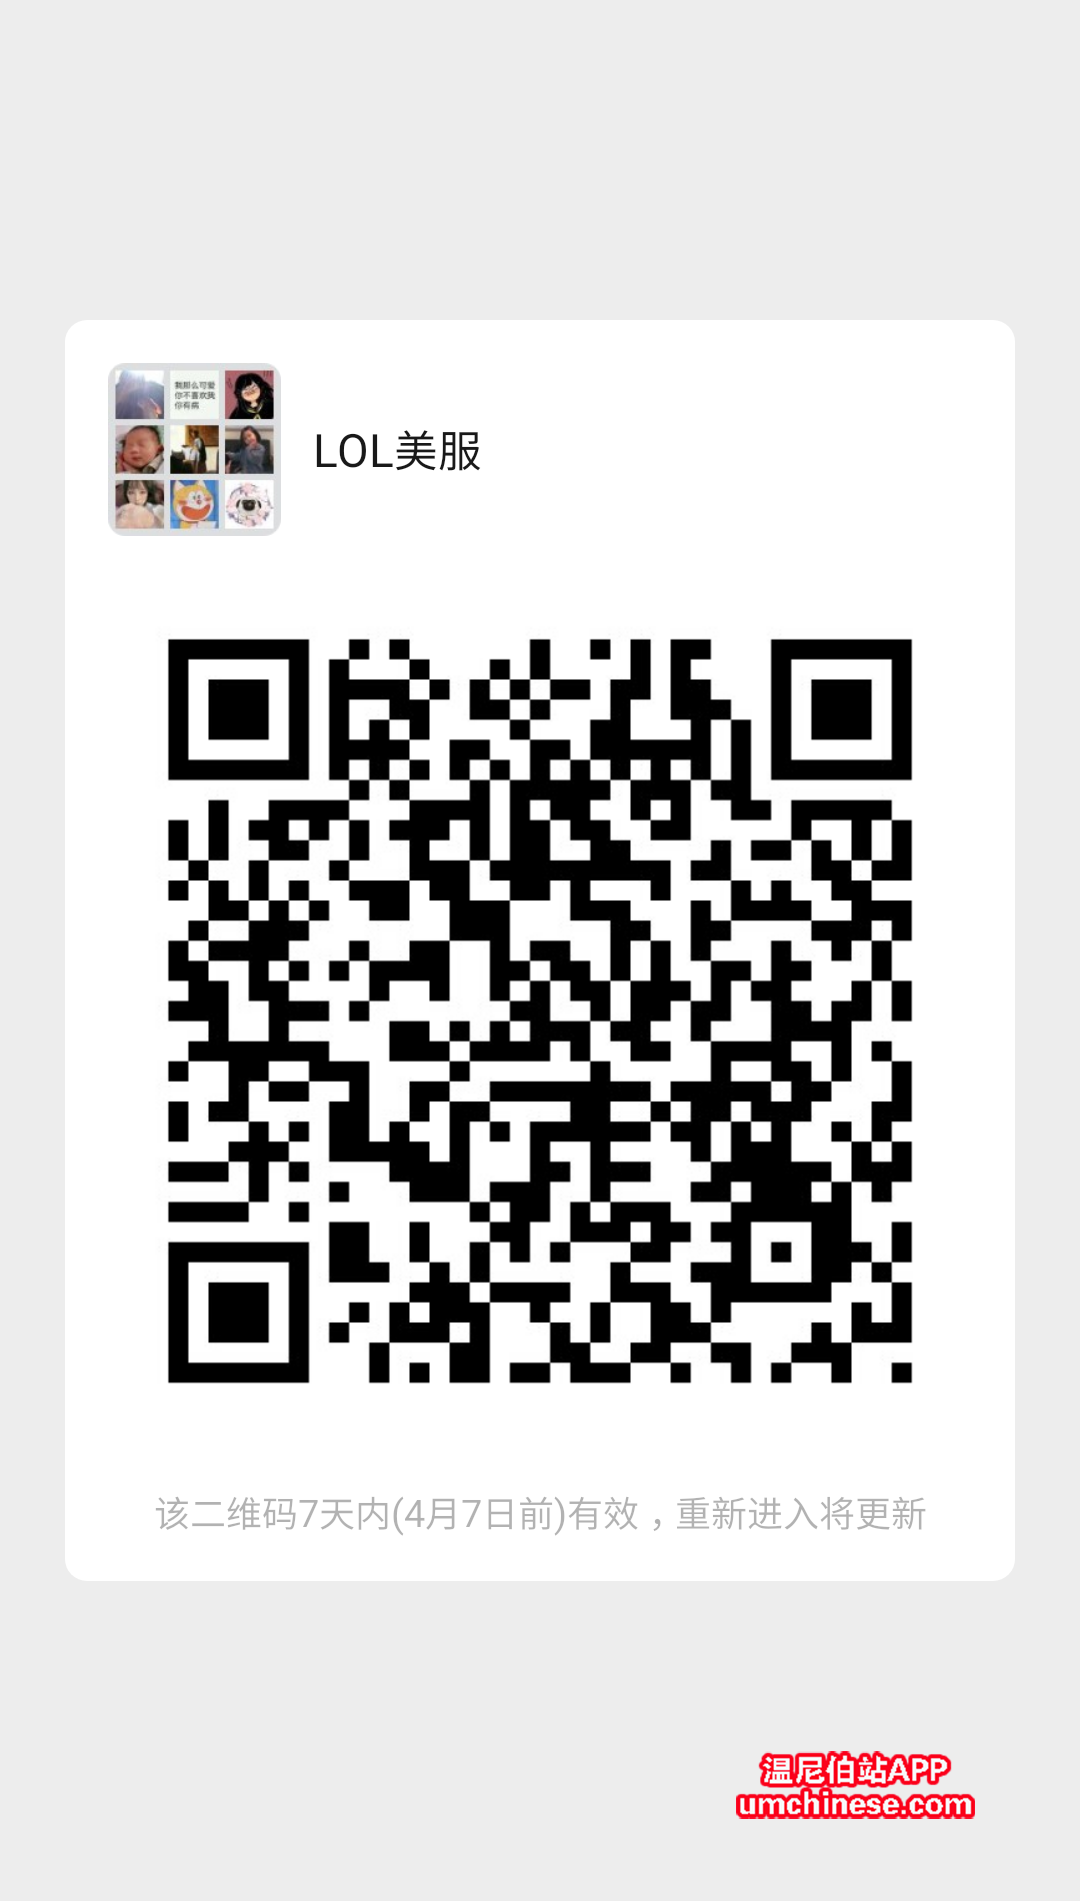 wechat image_20200331093734.png